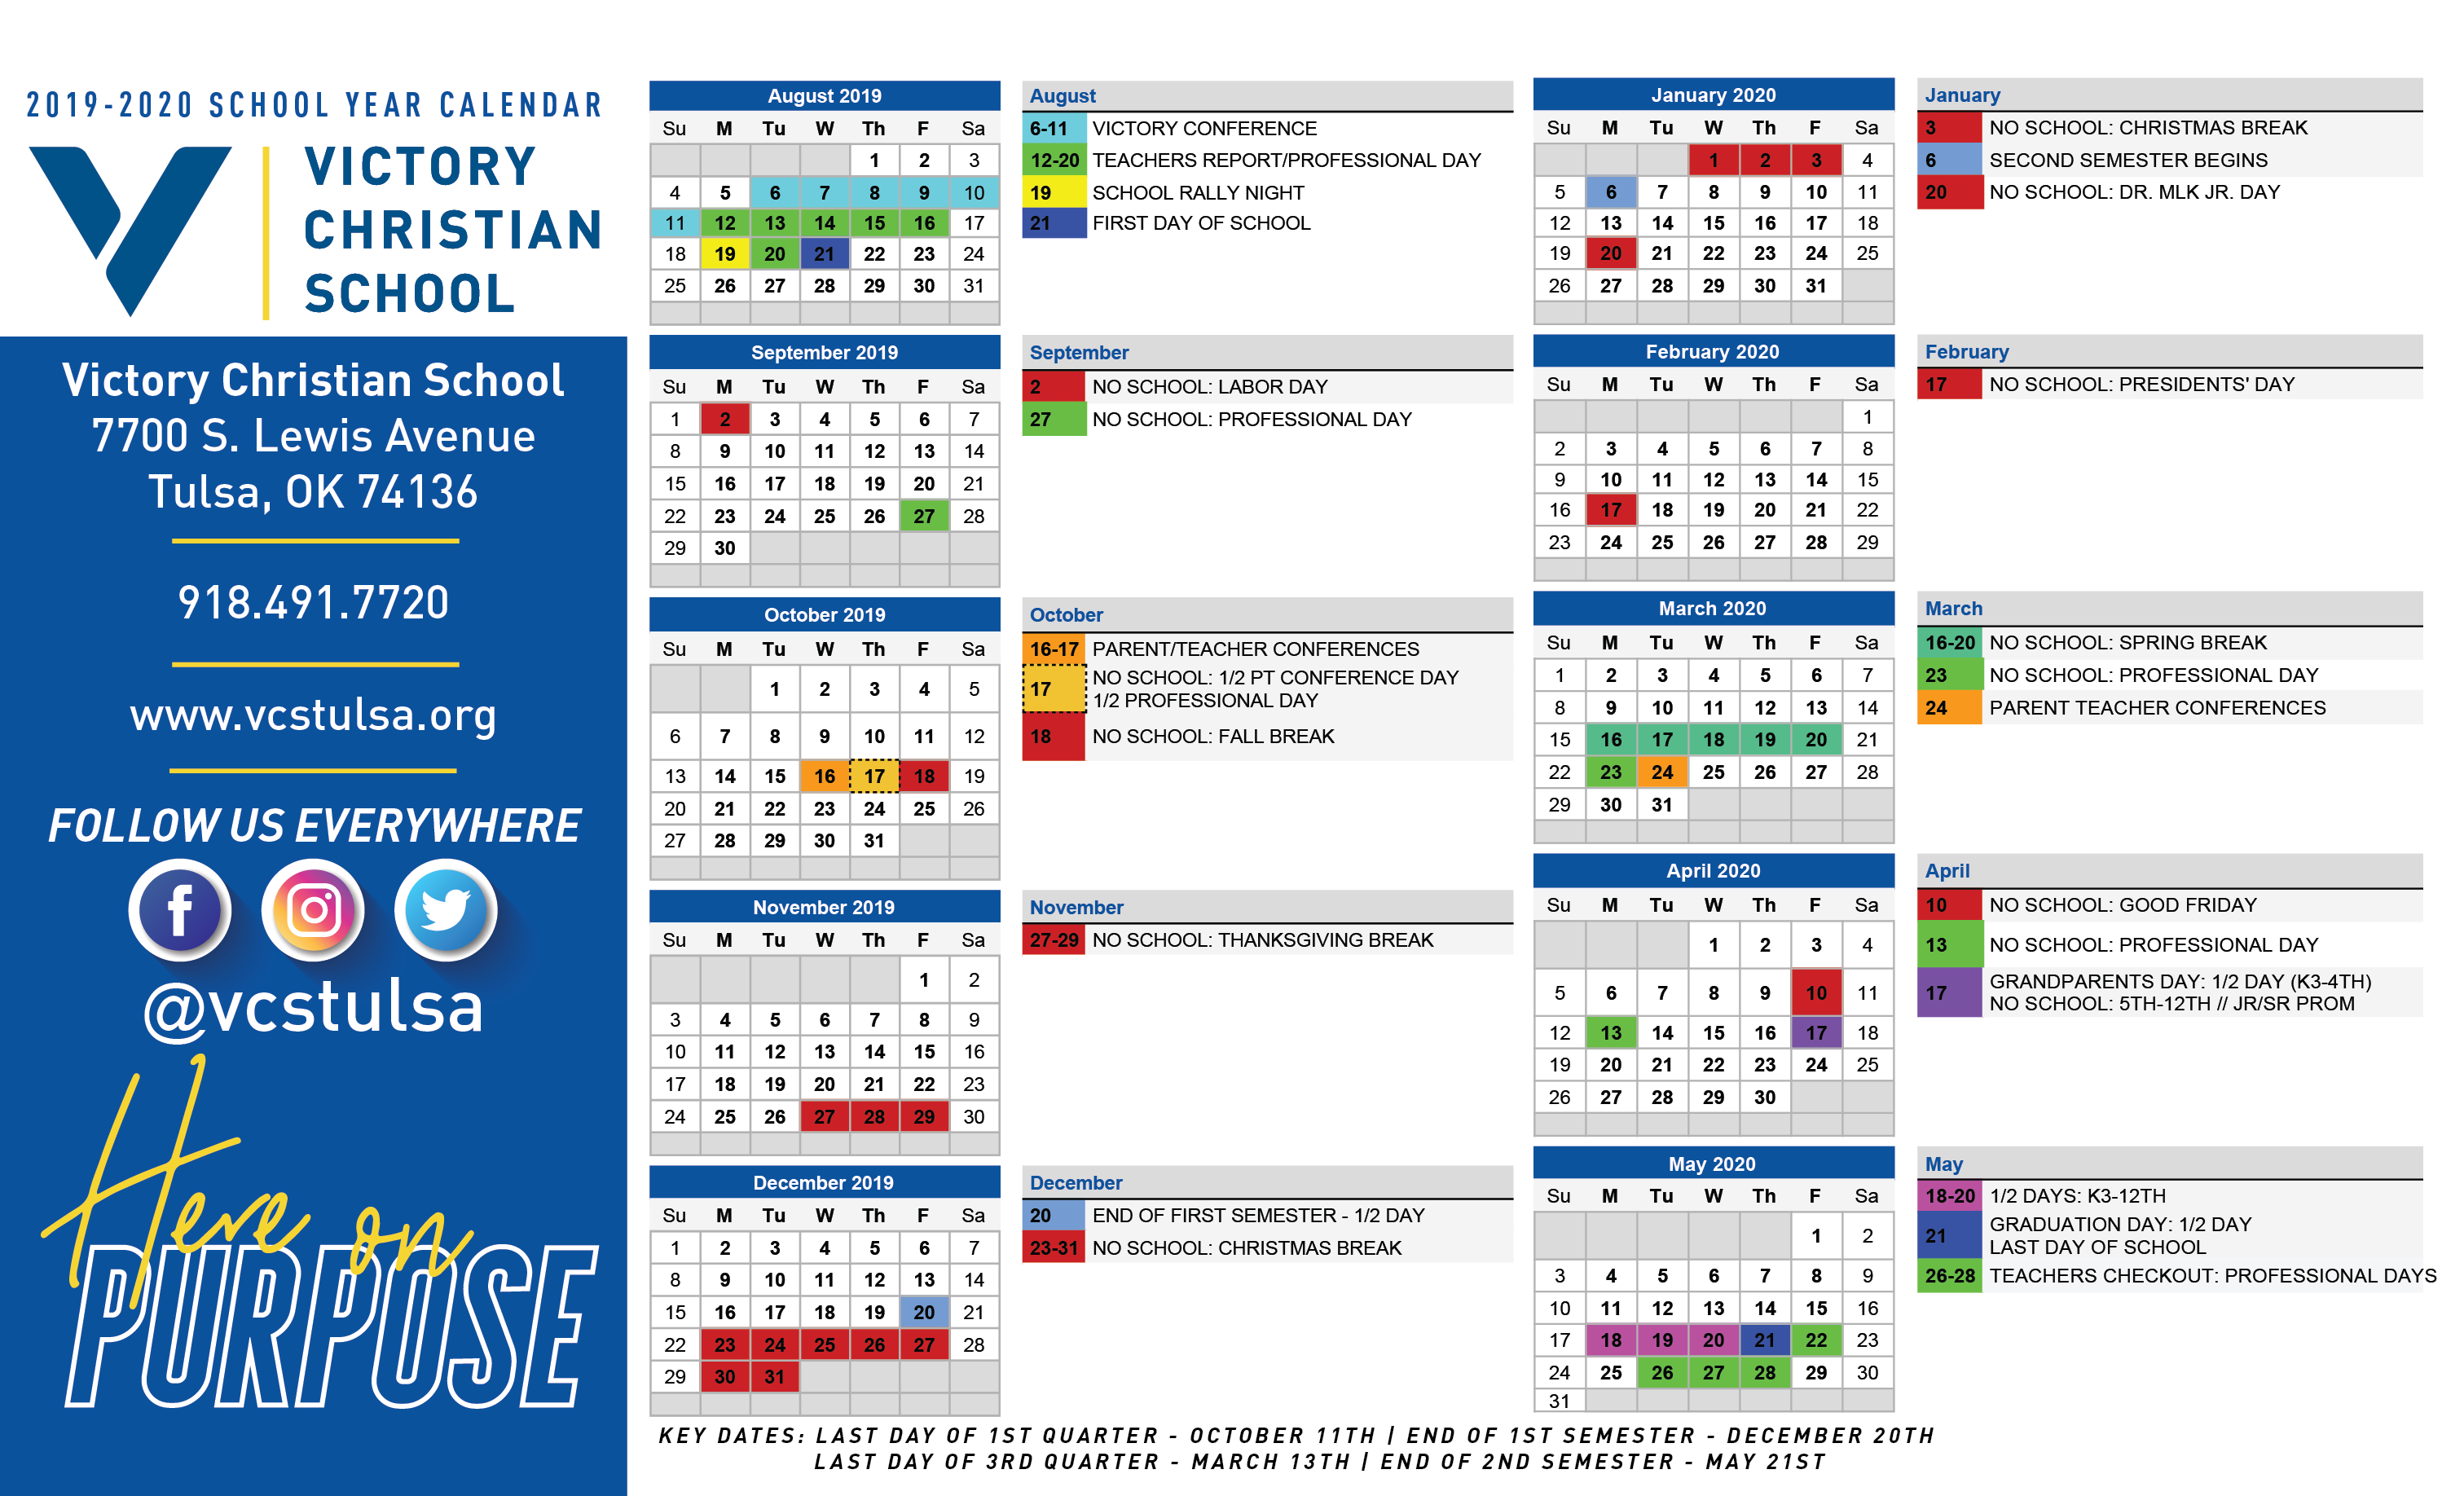 University Of Tulsa 2021 Calendar | Printable Calendar Intended For University Of Ri Academic Calendar 2021 2020